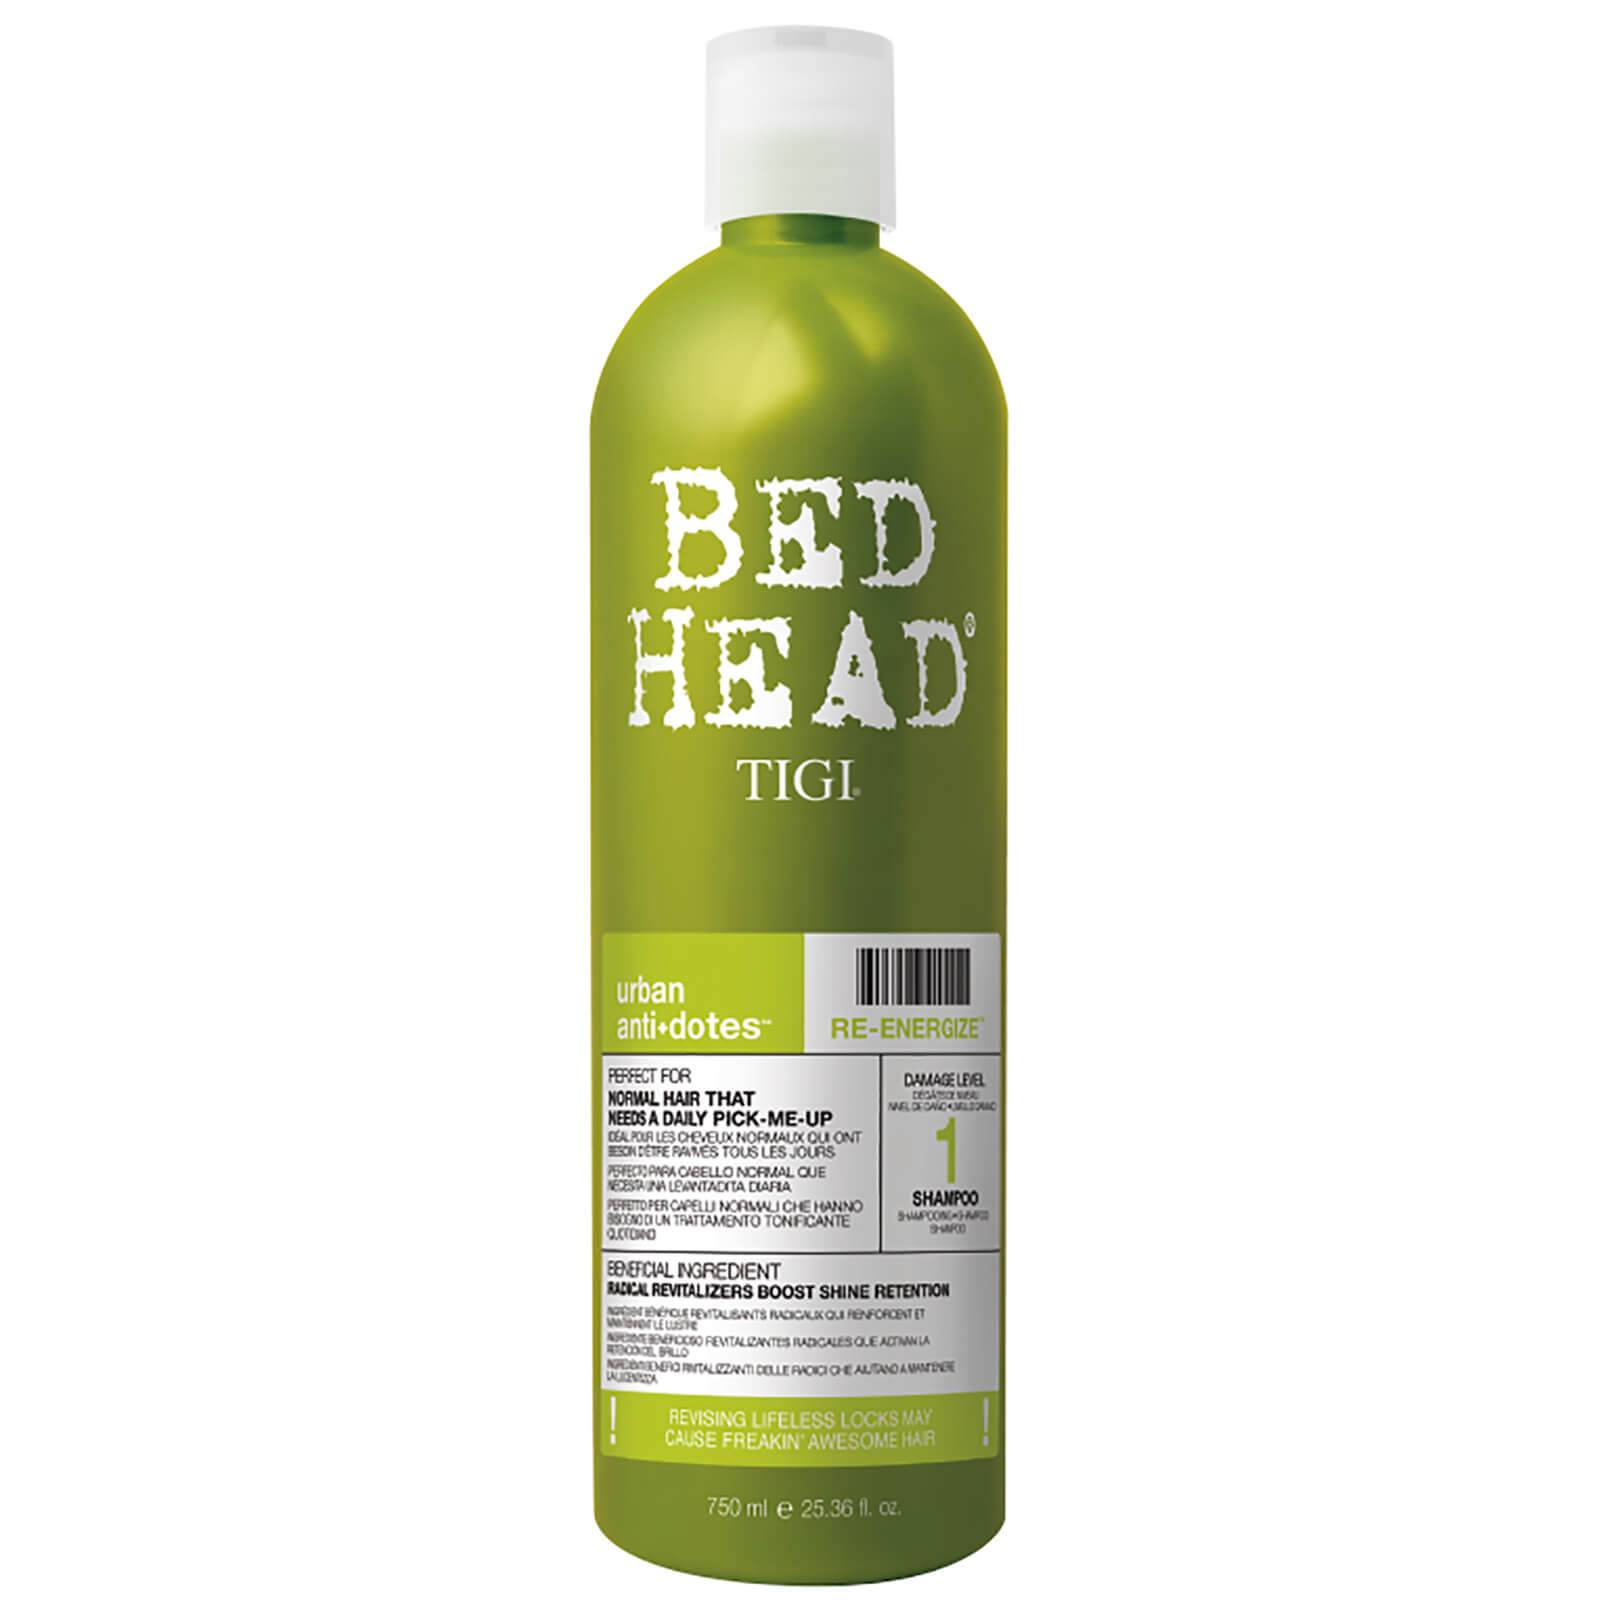 Tigi Bed Head Urban Antidotes Re-energize Daily Shampoo for Normal Hair 750ml